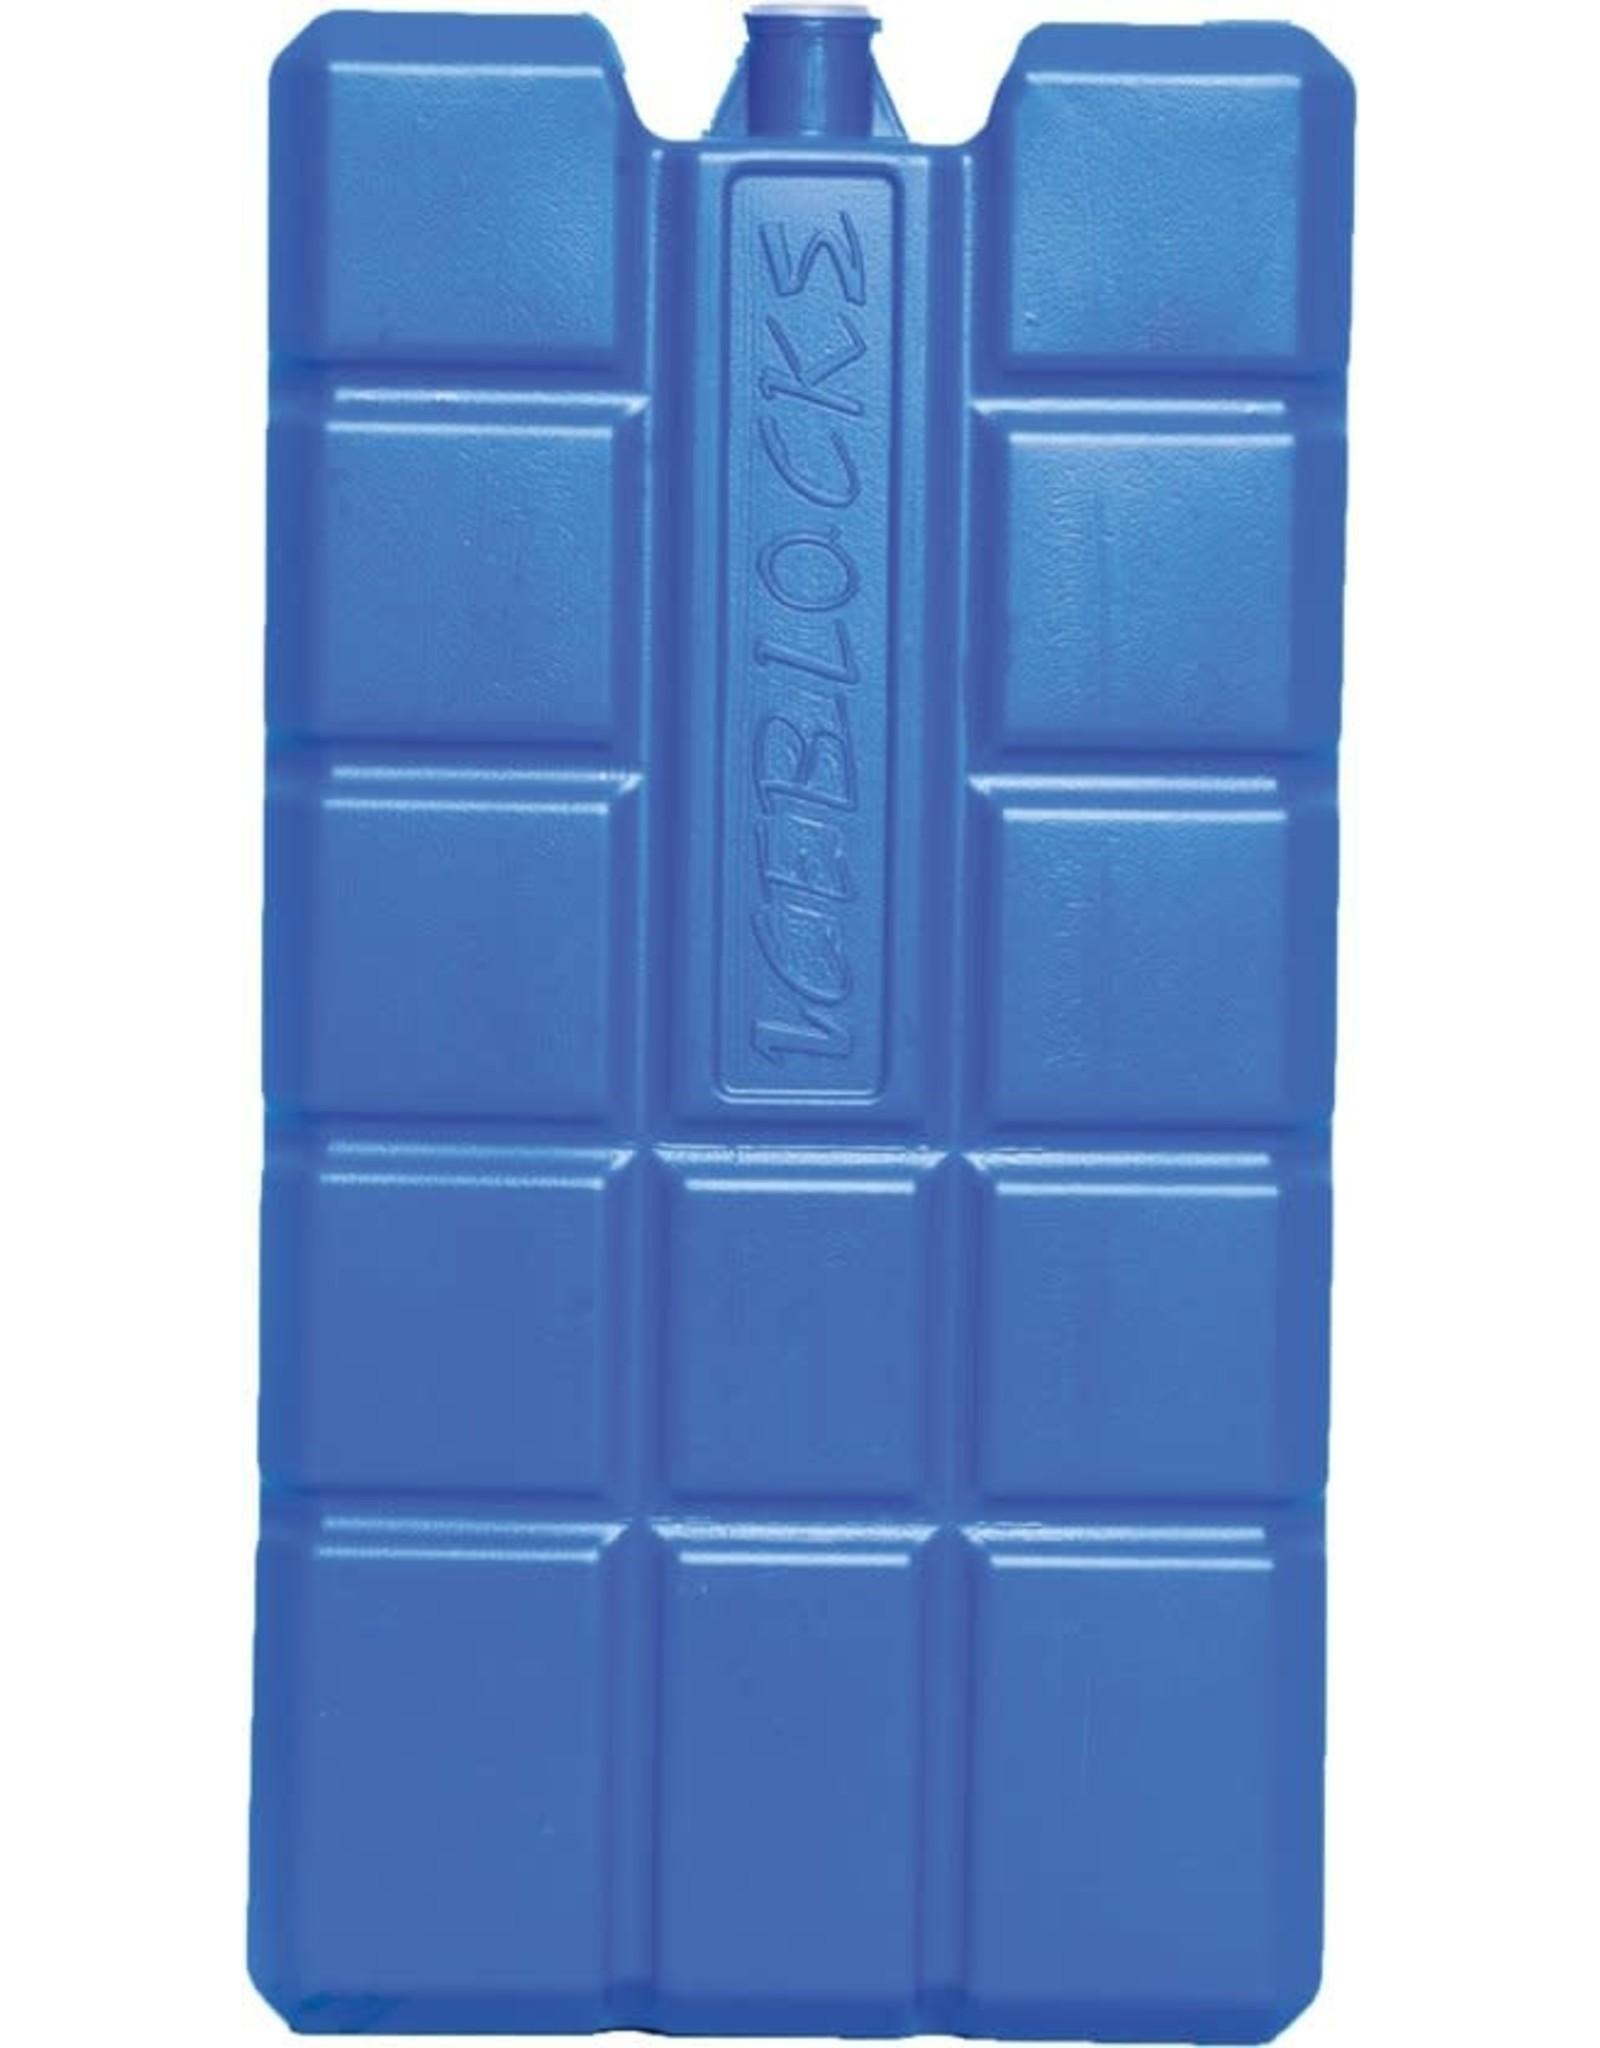 koelelement 400g blauw